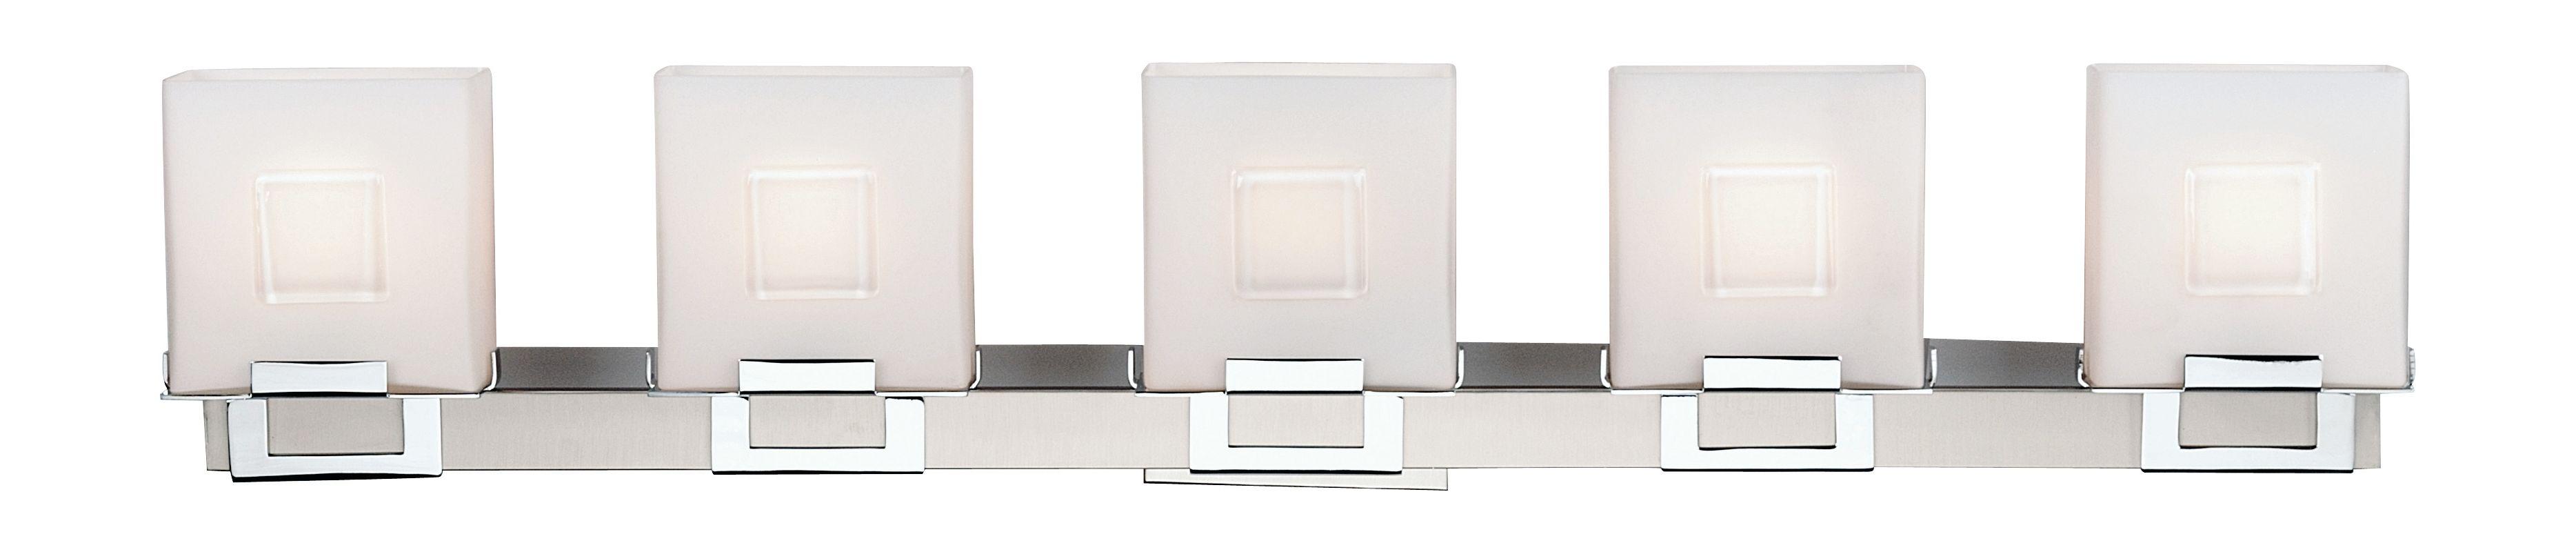 Philips F442336NV Square 5 Light Bathroom Vanity Light Satin Nickel